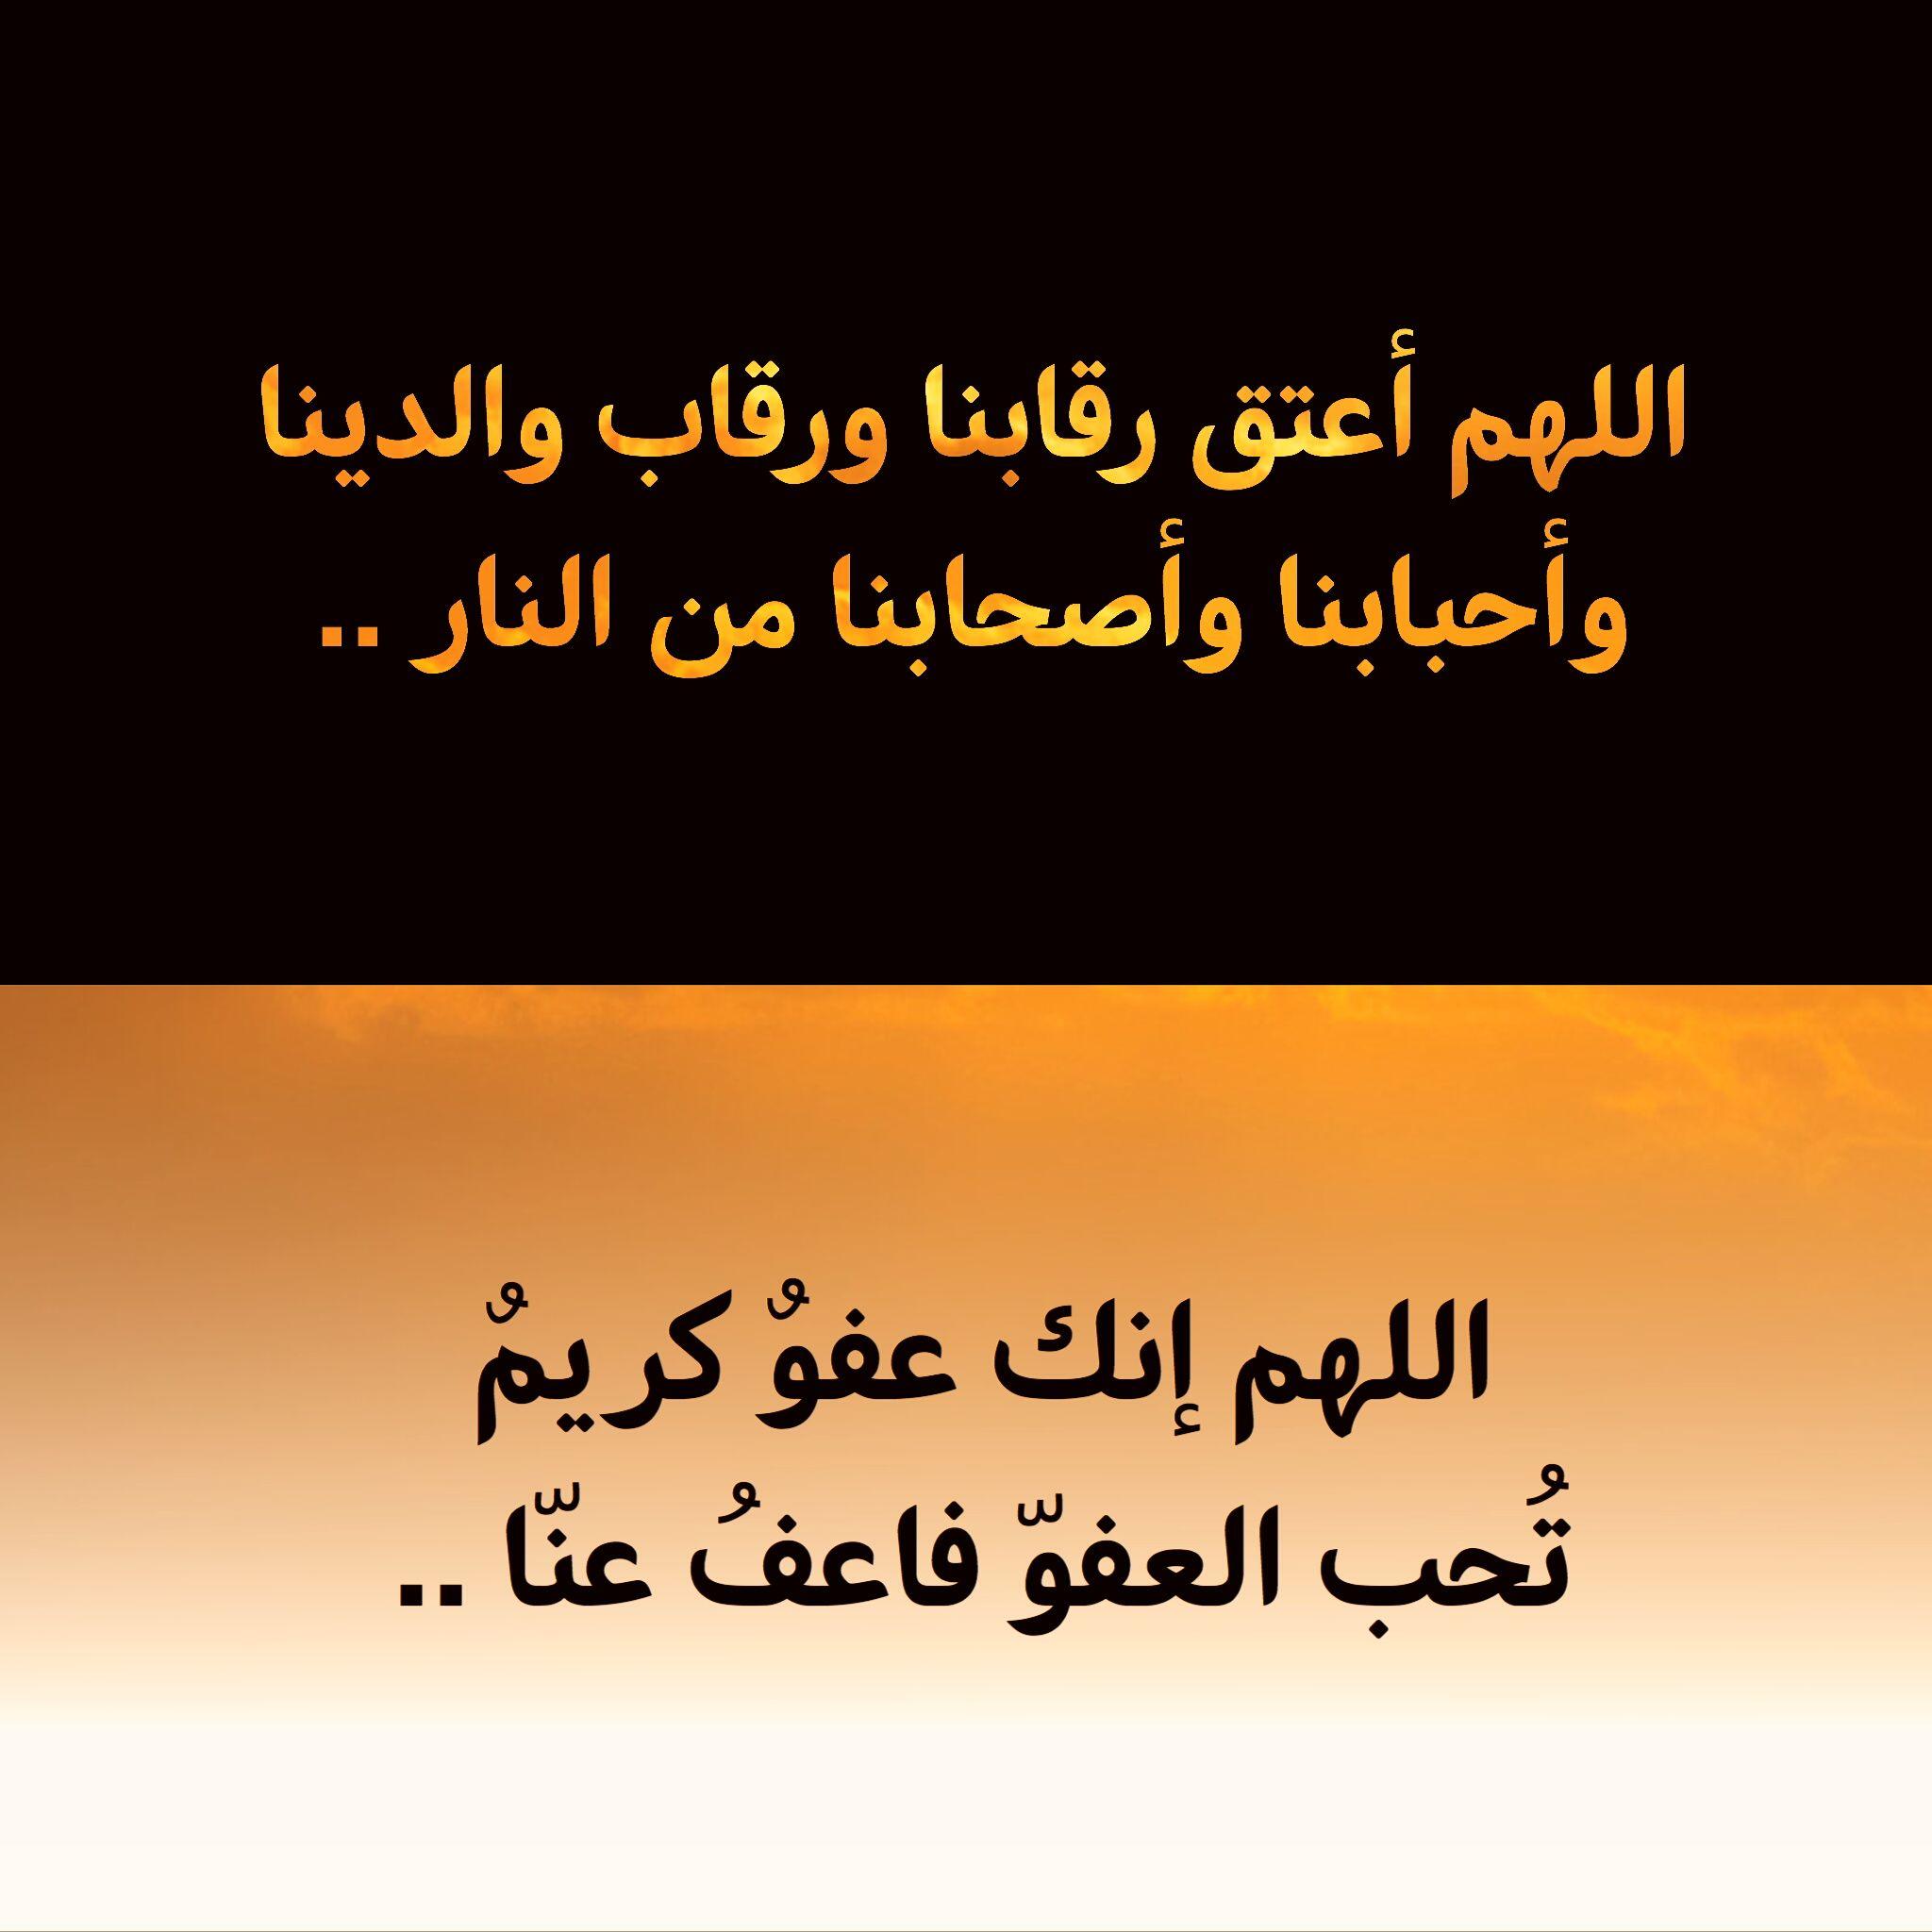 Pin By أدعية وأذكار On الدعاء Calligraphy Arabic Calligraphy Arabic